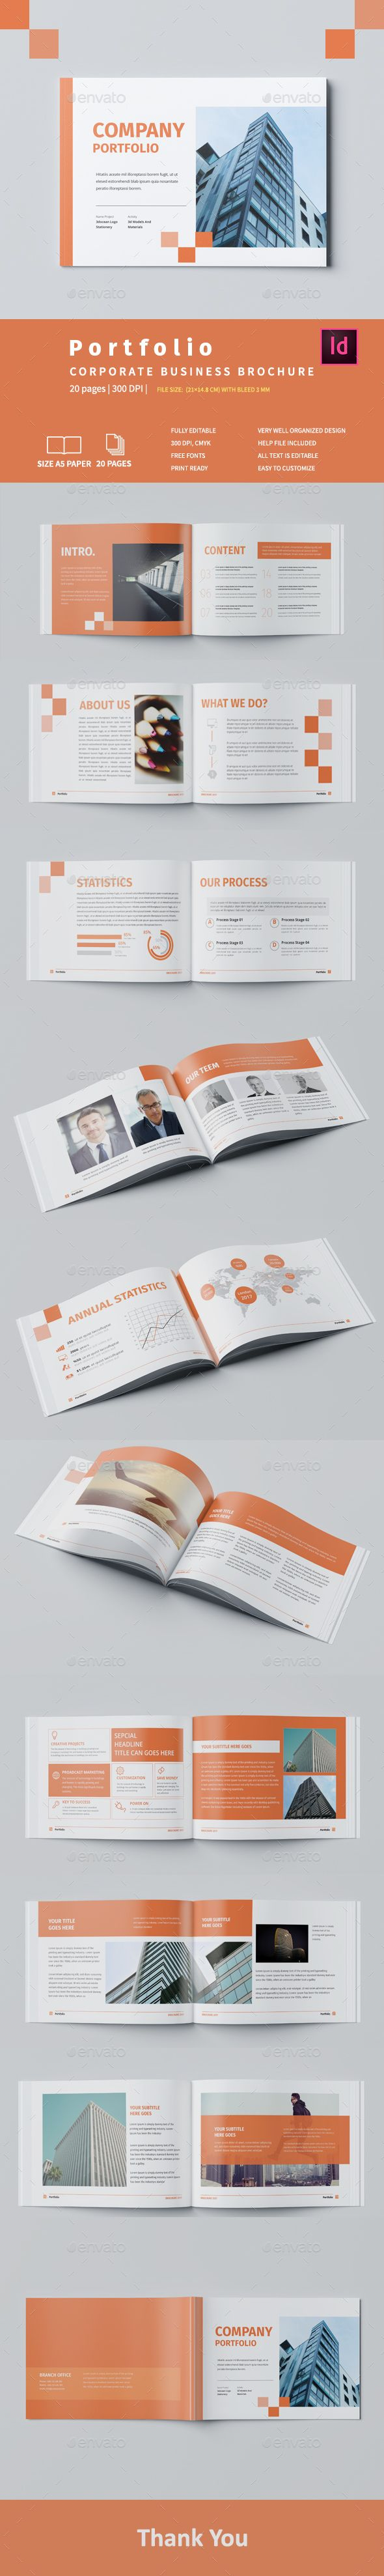 Company portfolio 2017